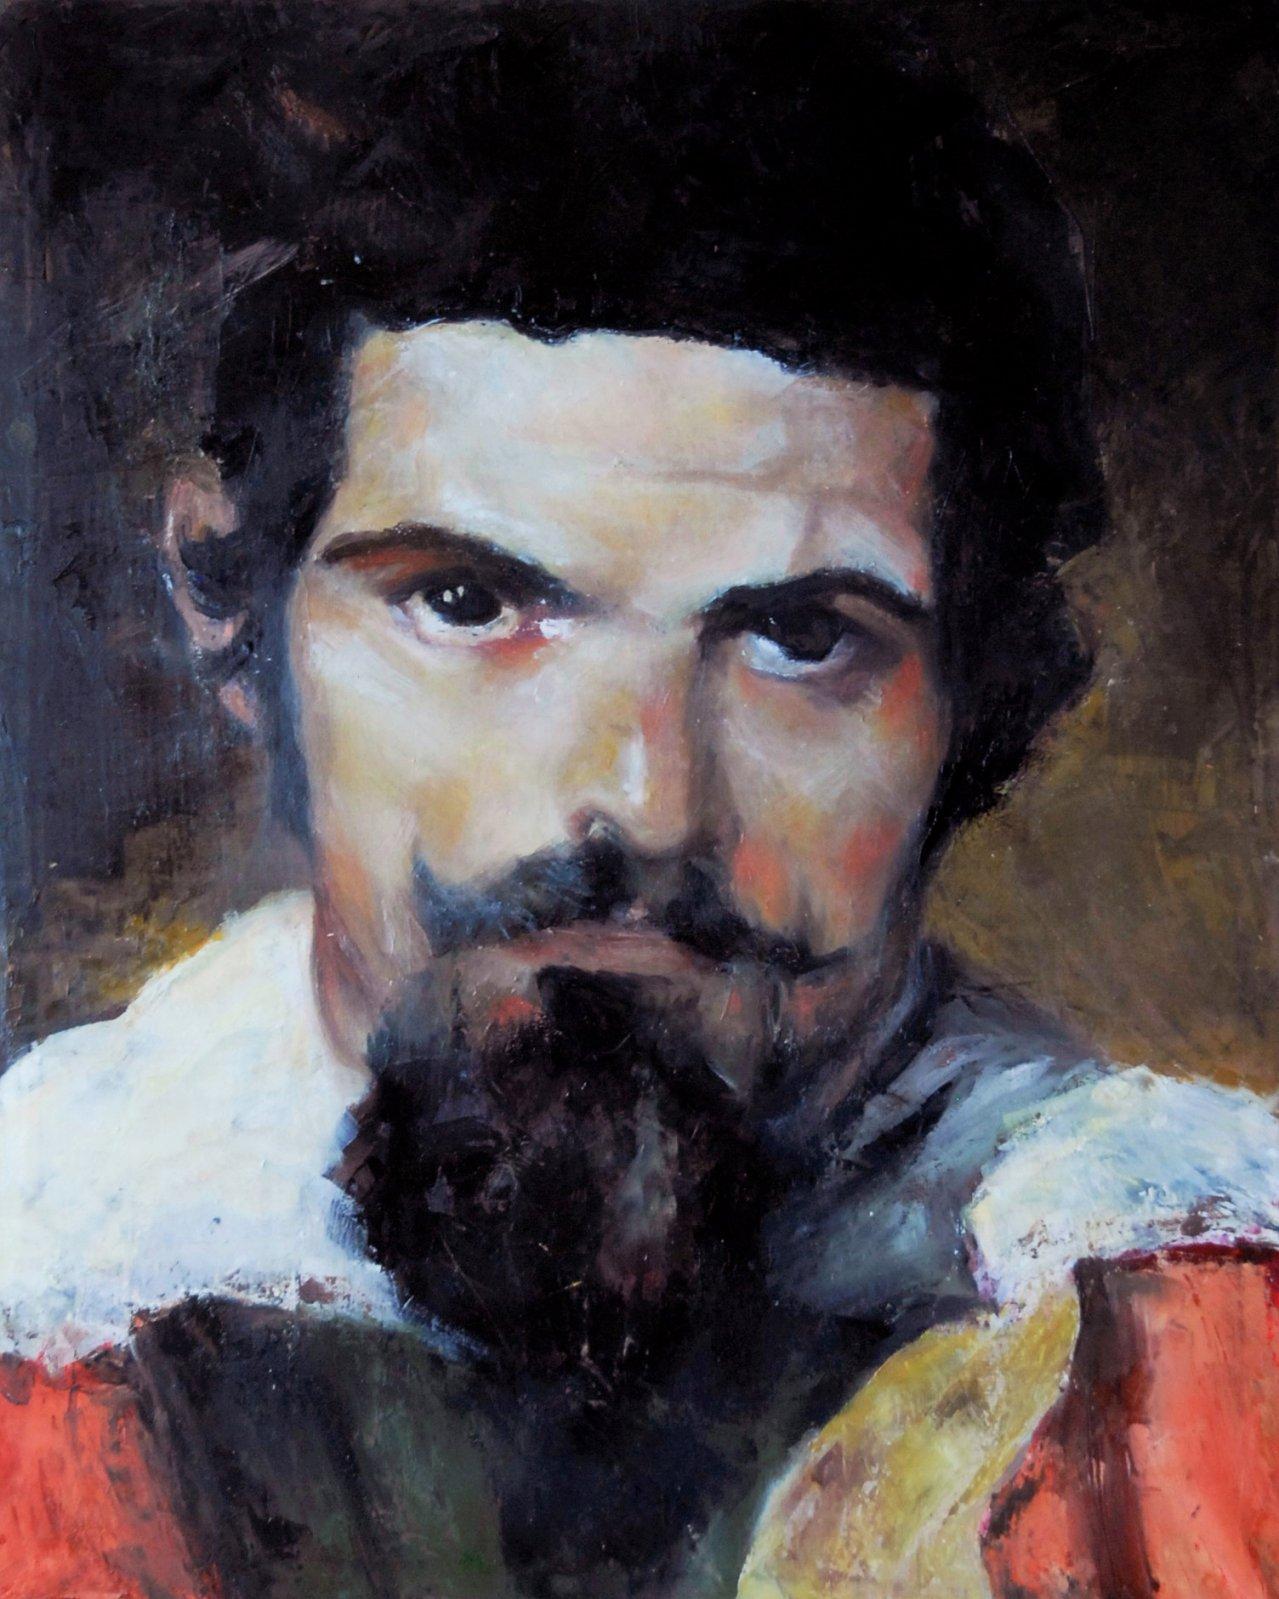 Don Sebastian de la Morra - Homenaje a Diego Velazquez (2018) - Sandra Renzi